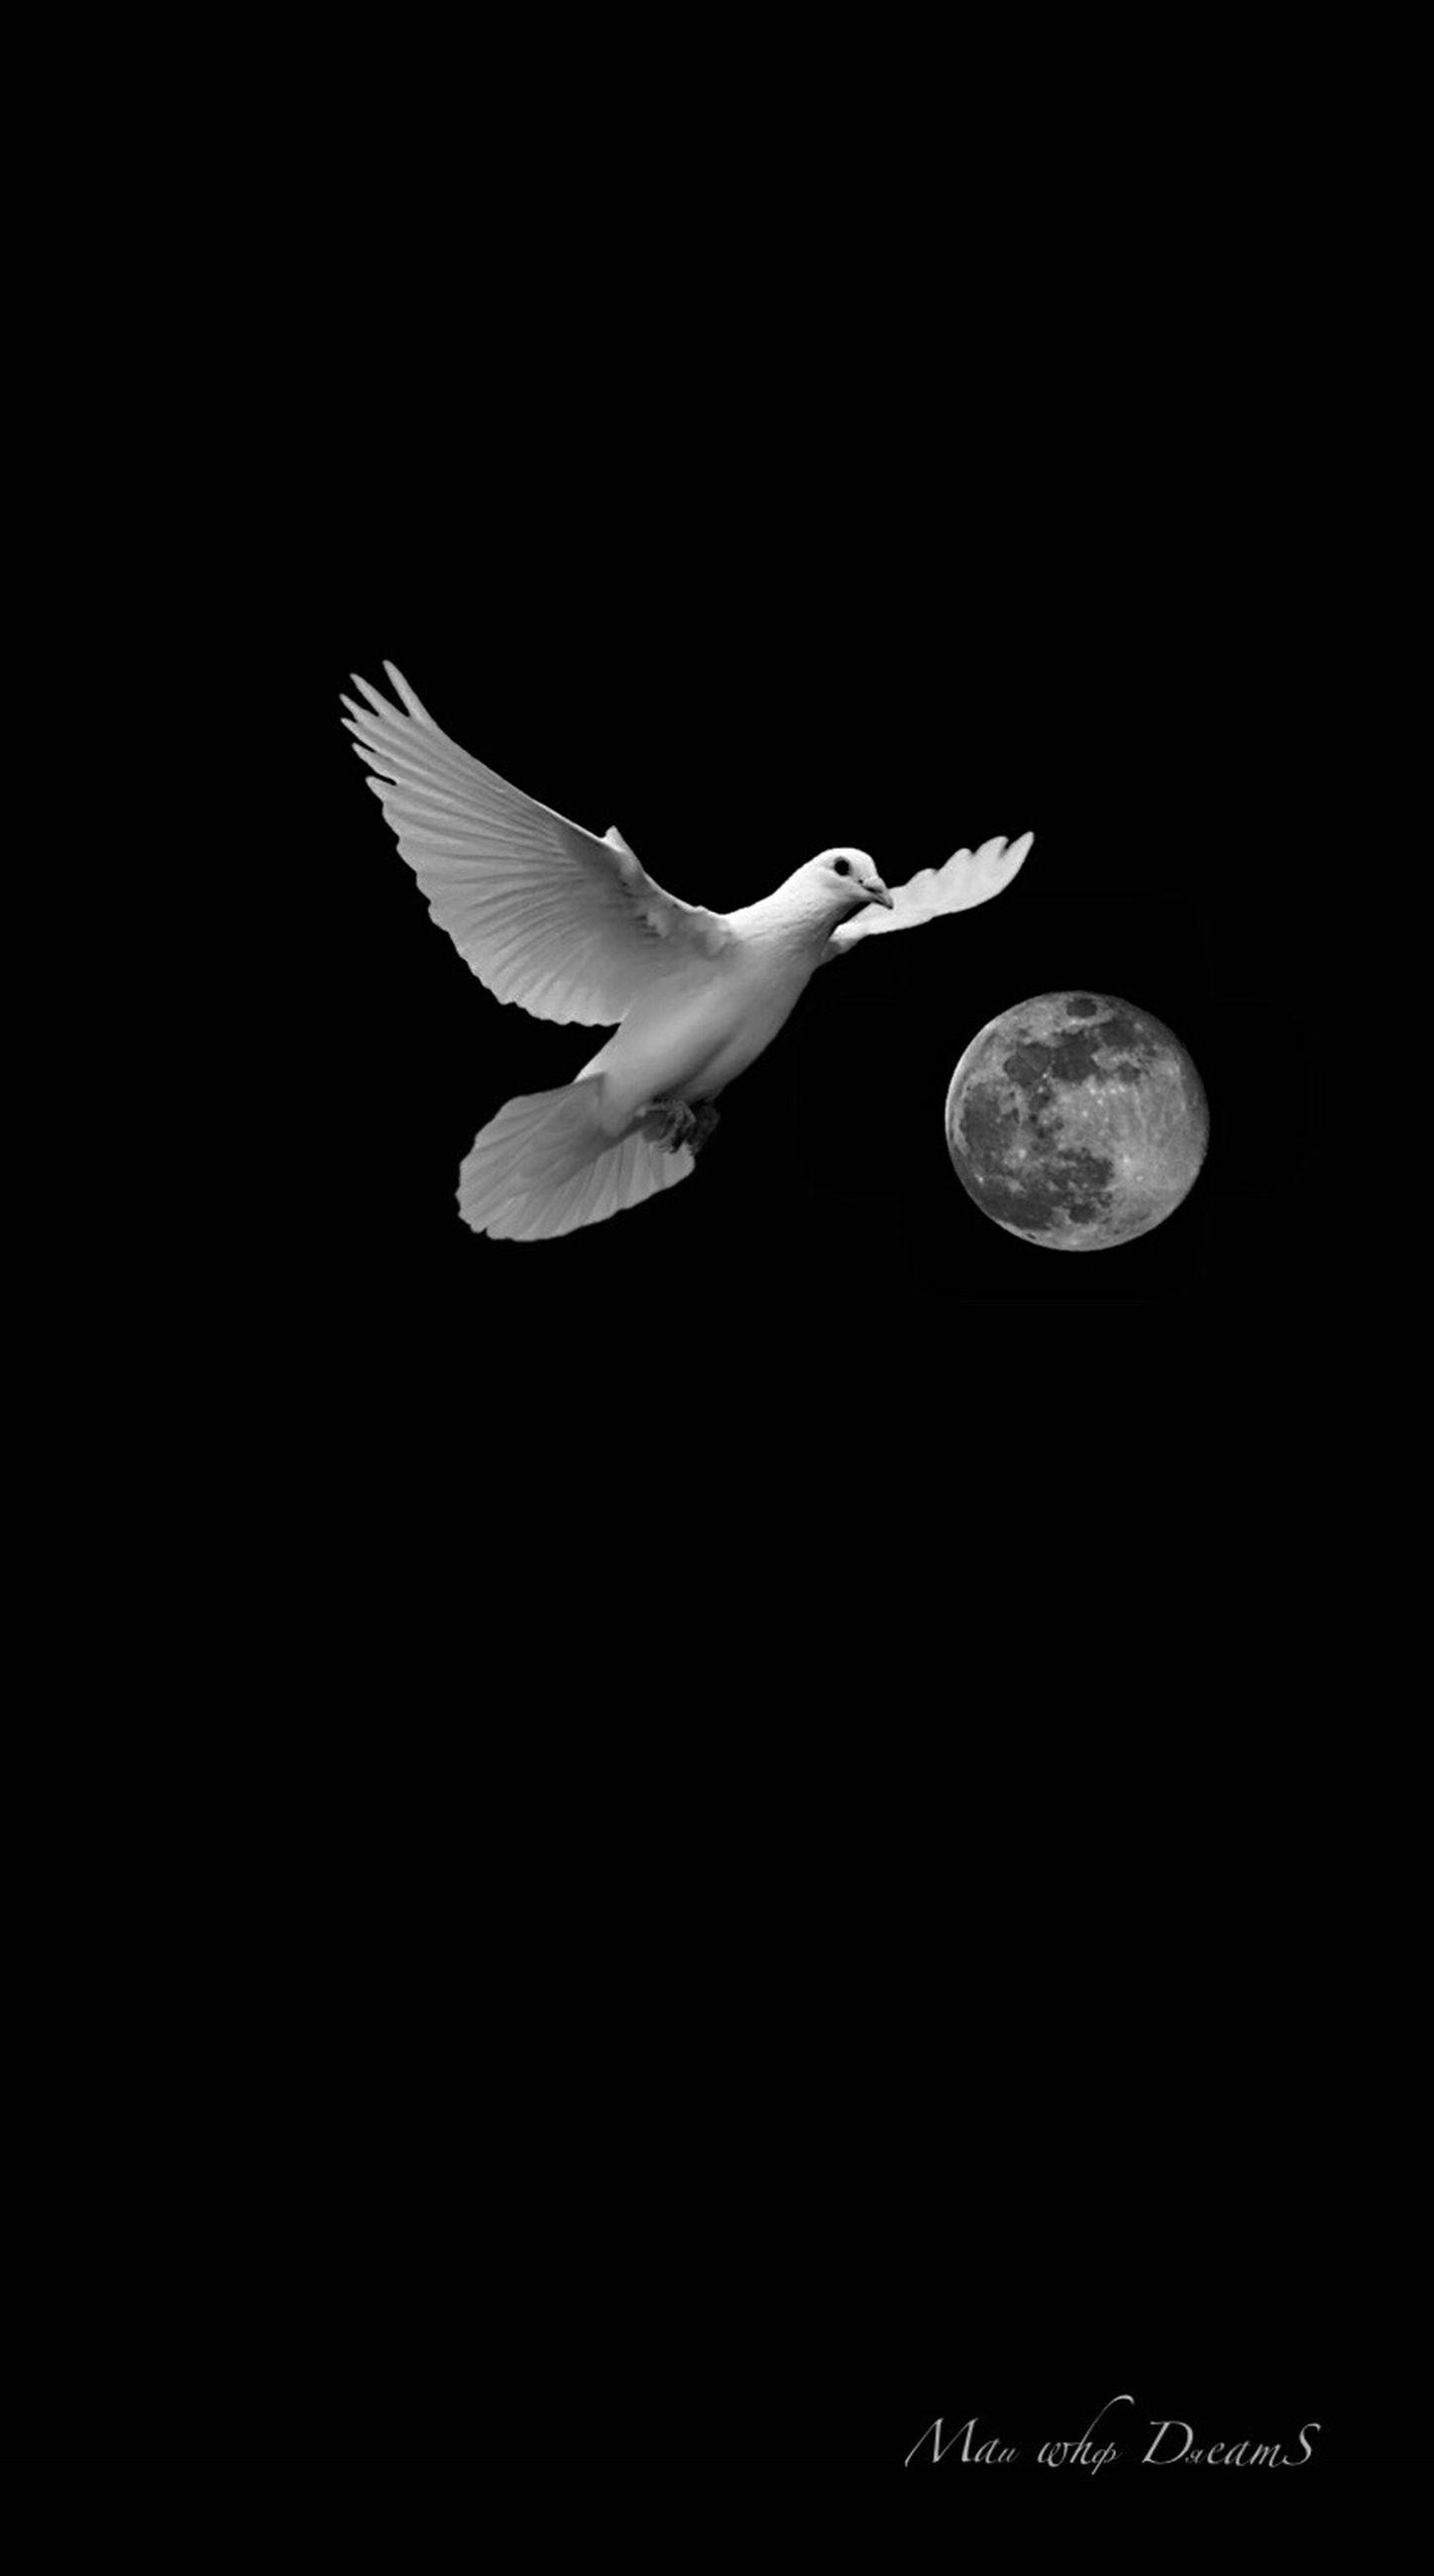 flying, spread wings, animal, vertebrate, animal themes, bird, animals in the wild, animal wildlife, moon, one animal, copy space, black background, motion, mid-air, nature, sky, no people, night, studio shot, full length, full moon, dark, seagull, planetary moon